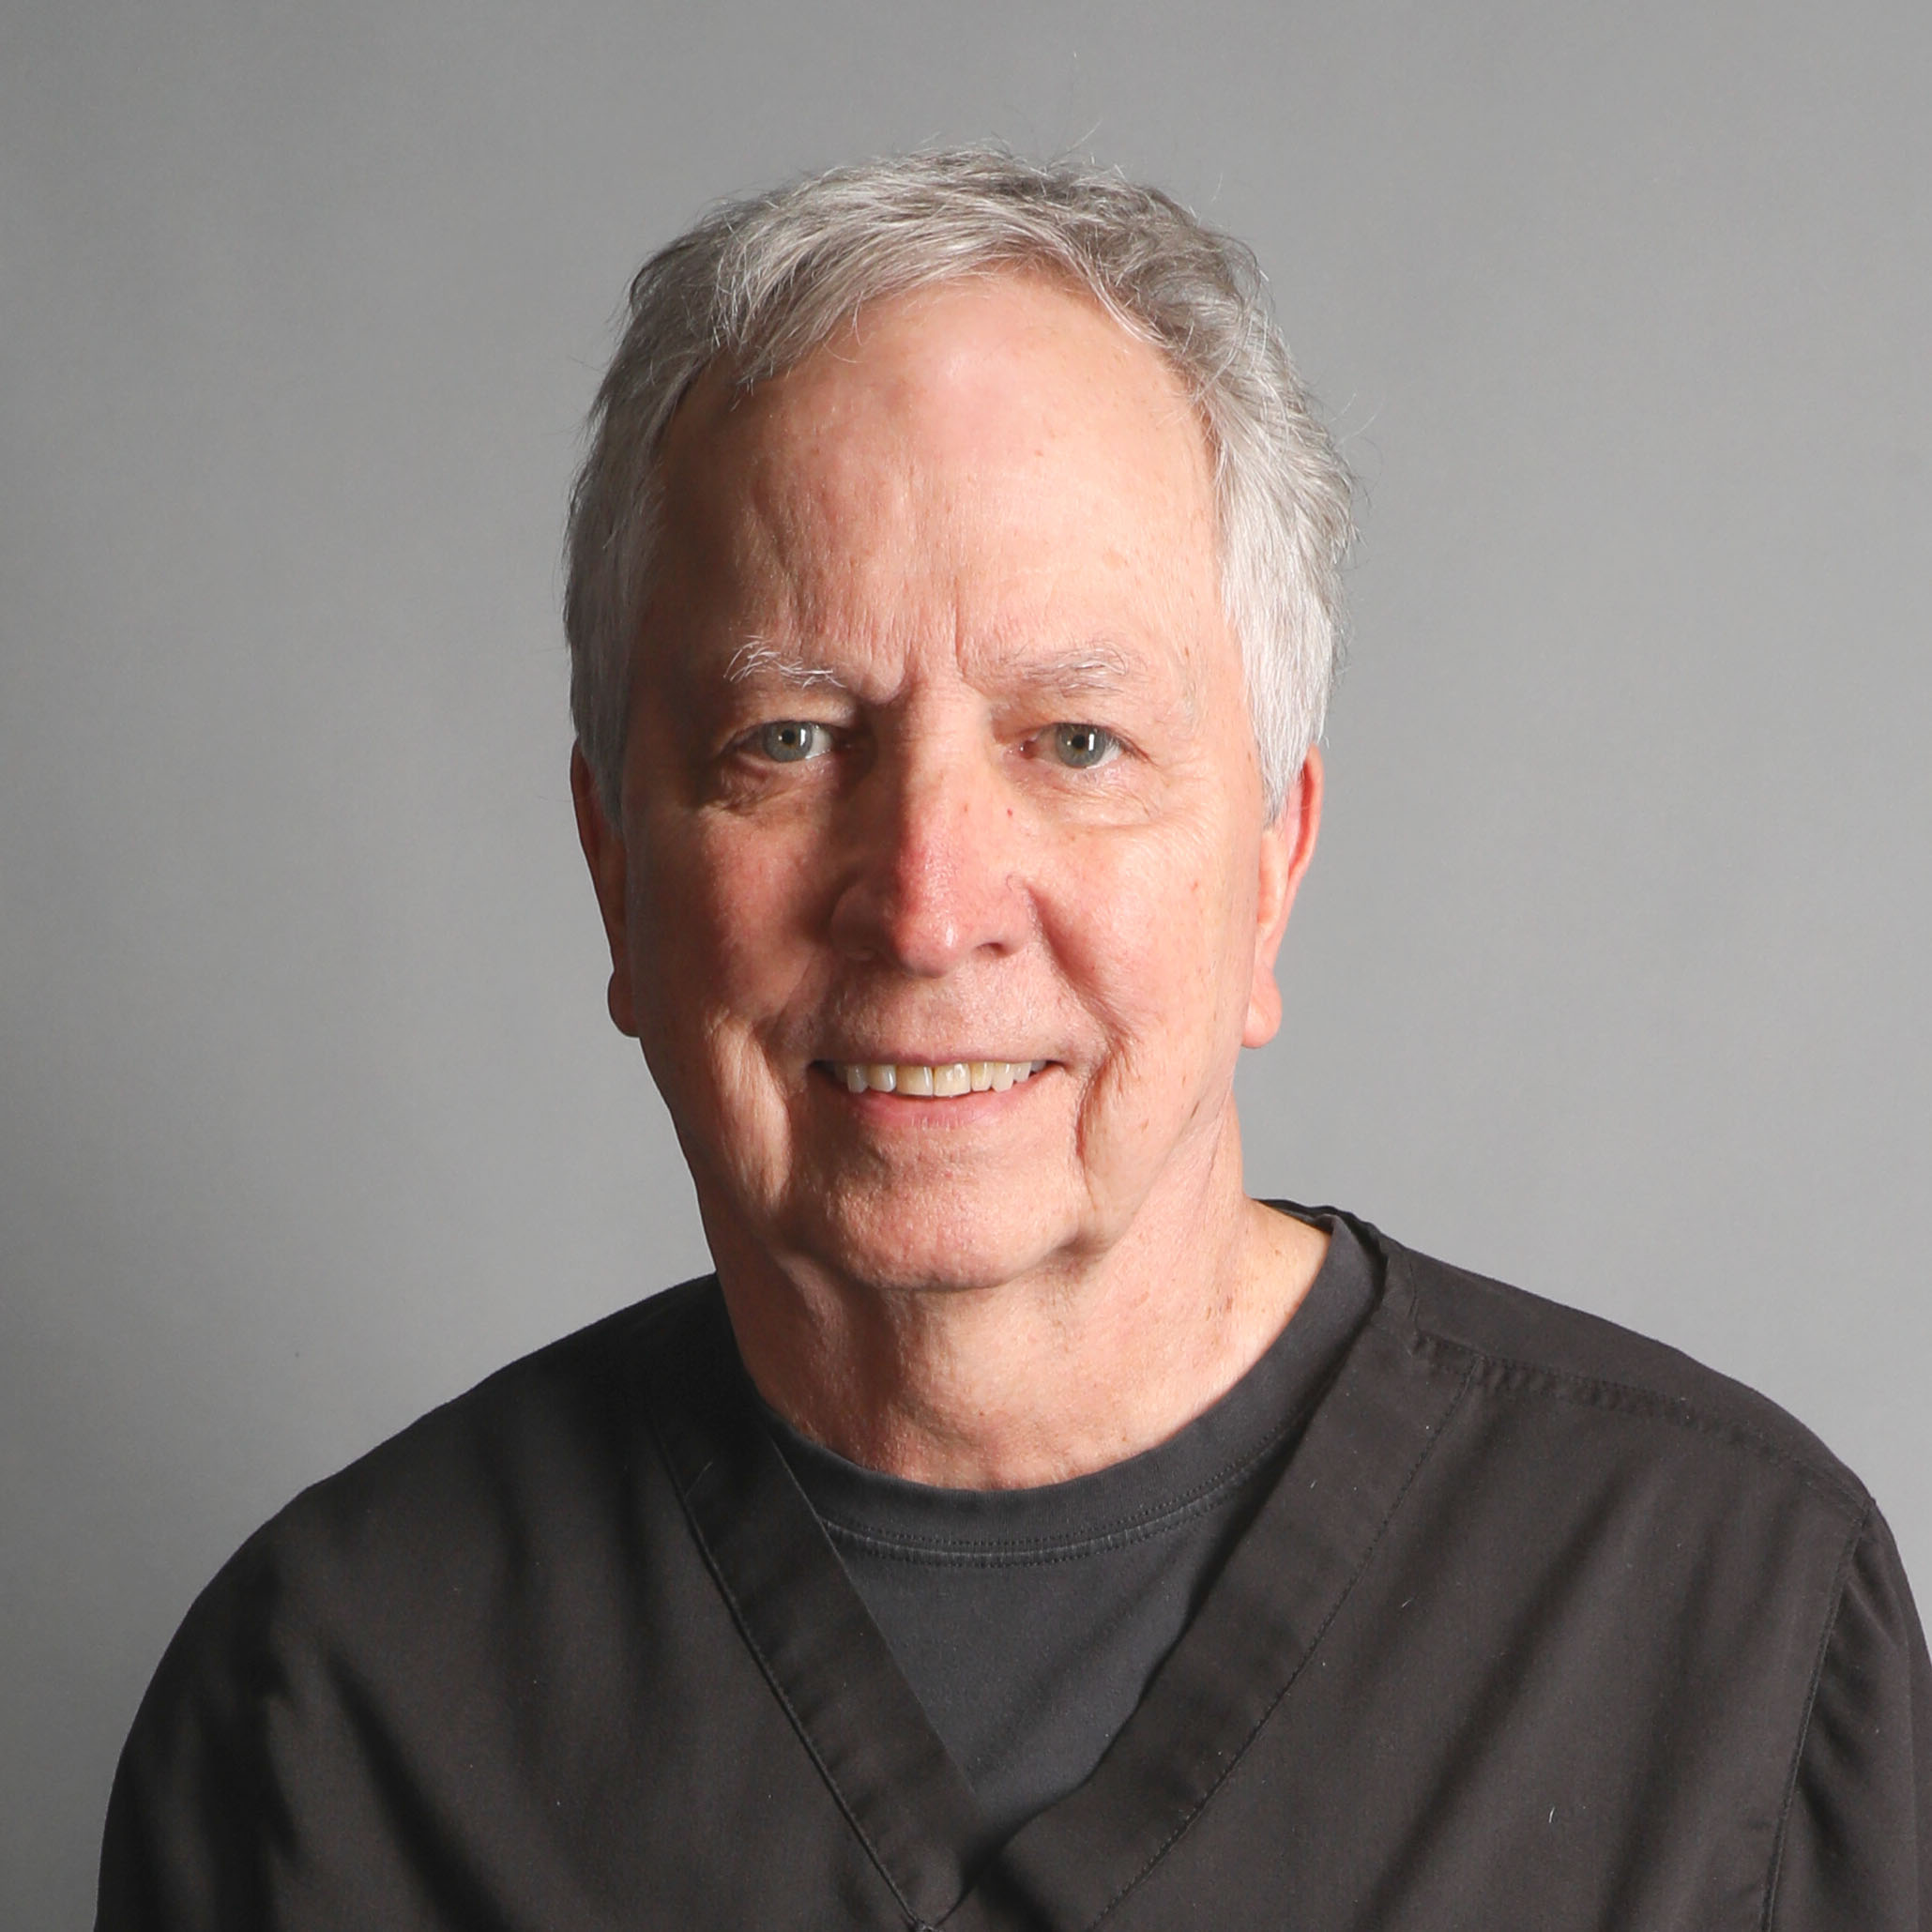 Dr. R. Michael Patton